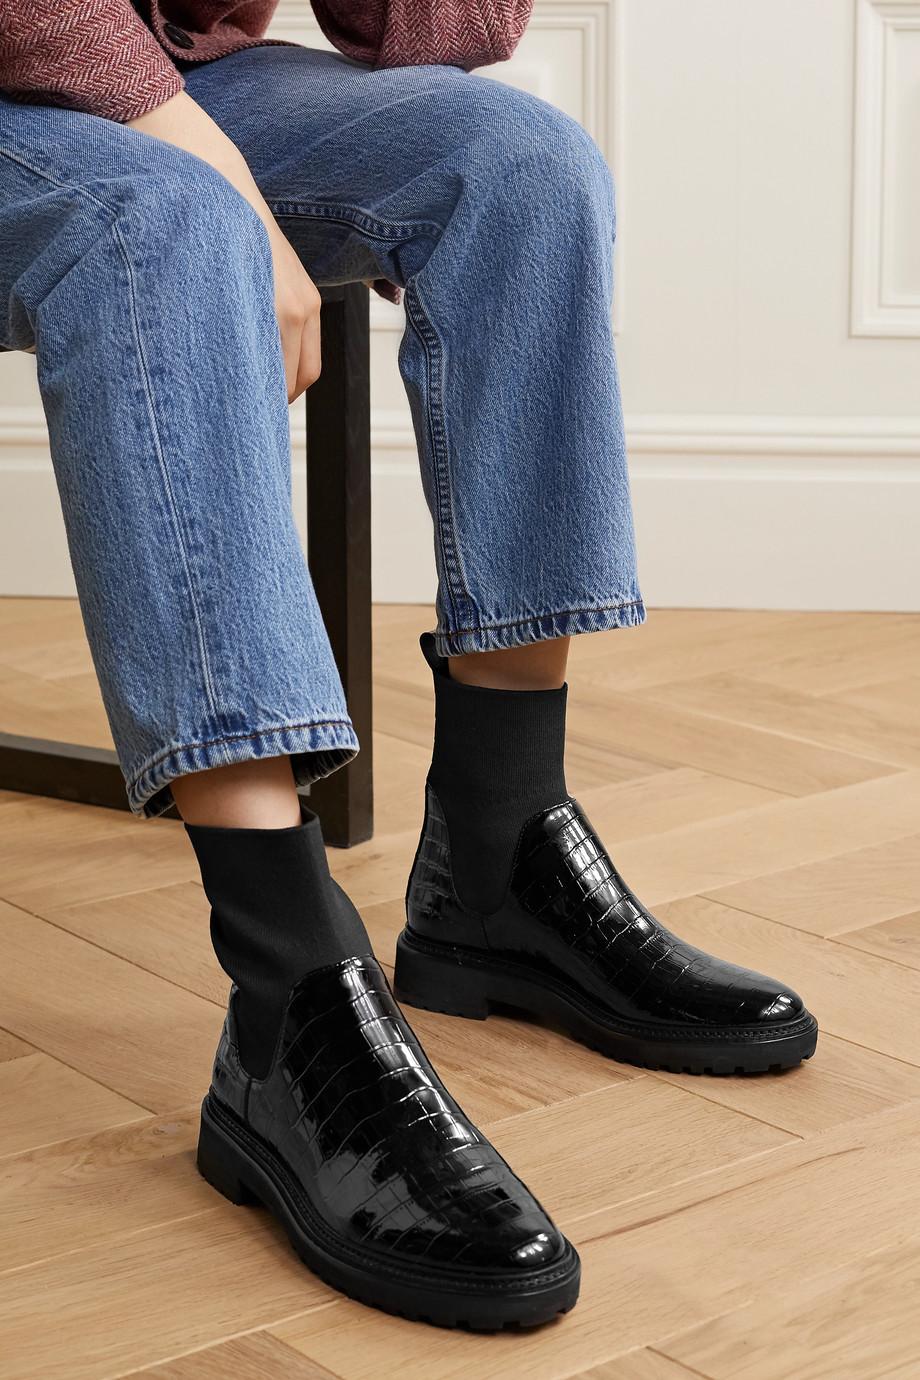 Loeffler Randall Bridget croc-effect patent-leather Chelsea boots